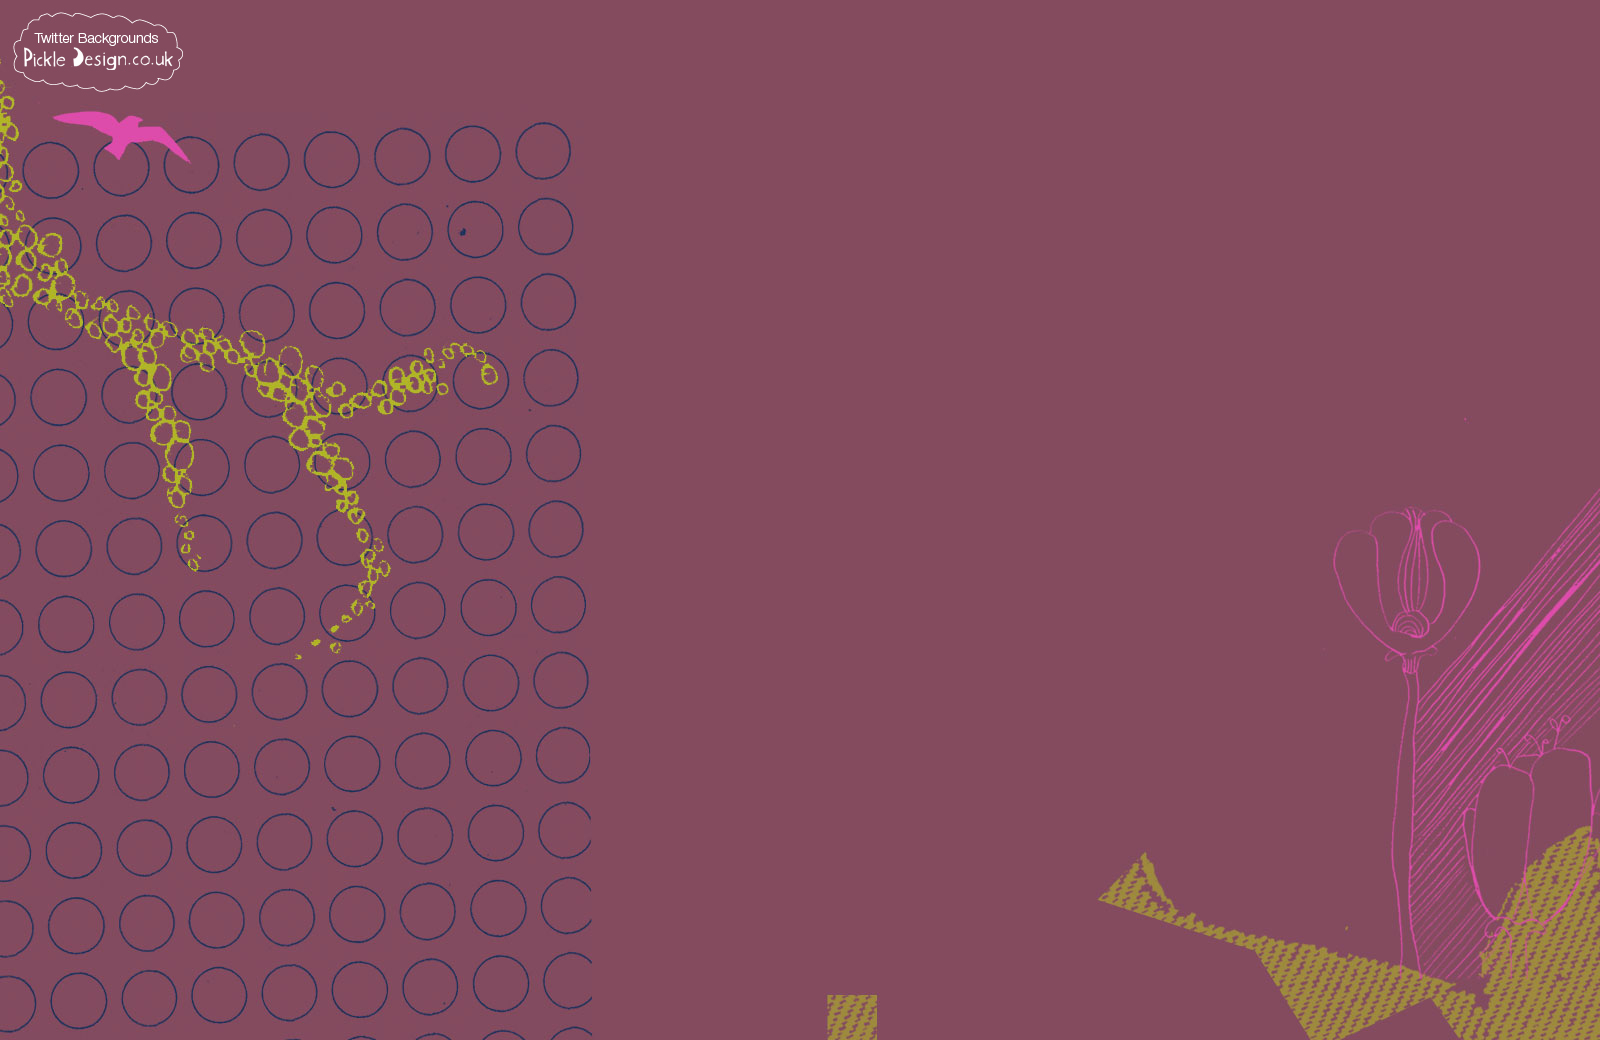 Purple Twitter Background 1600x1040